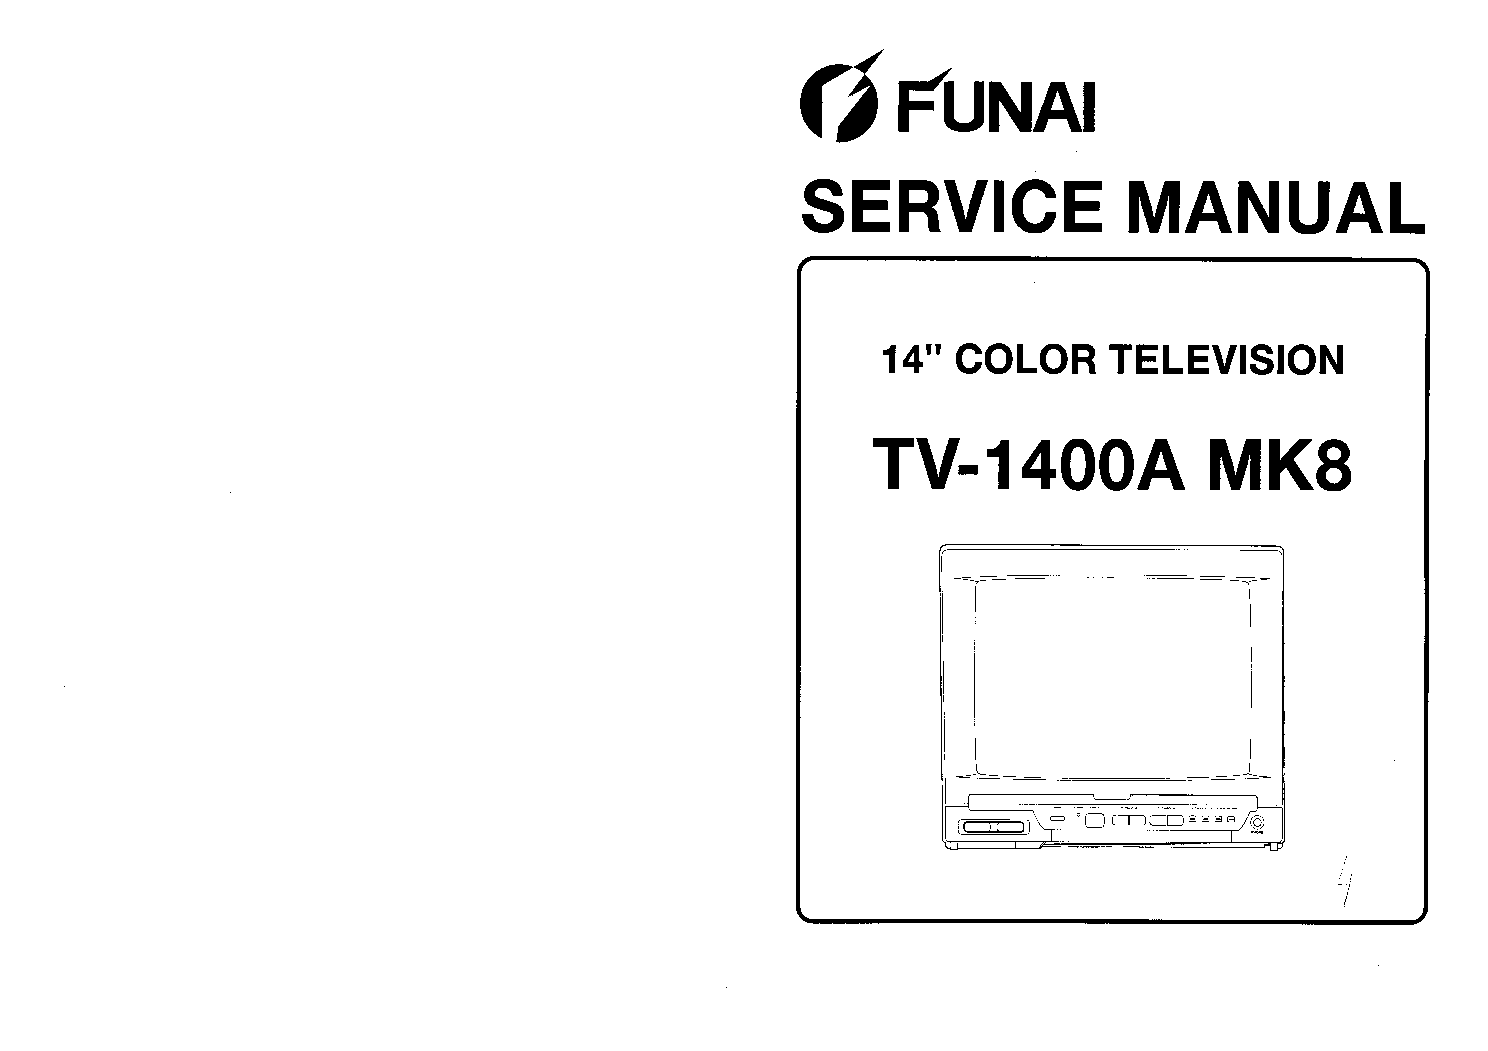 funai nlc 3216 service manual